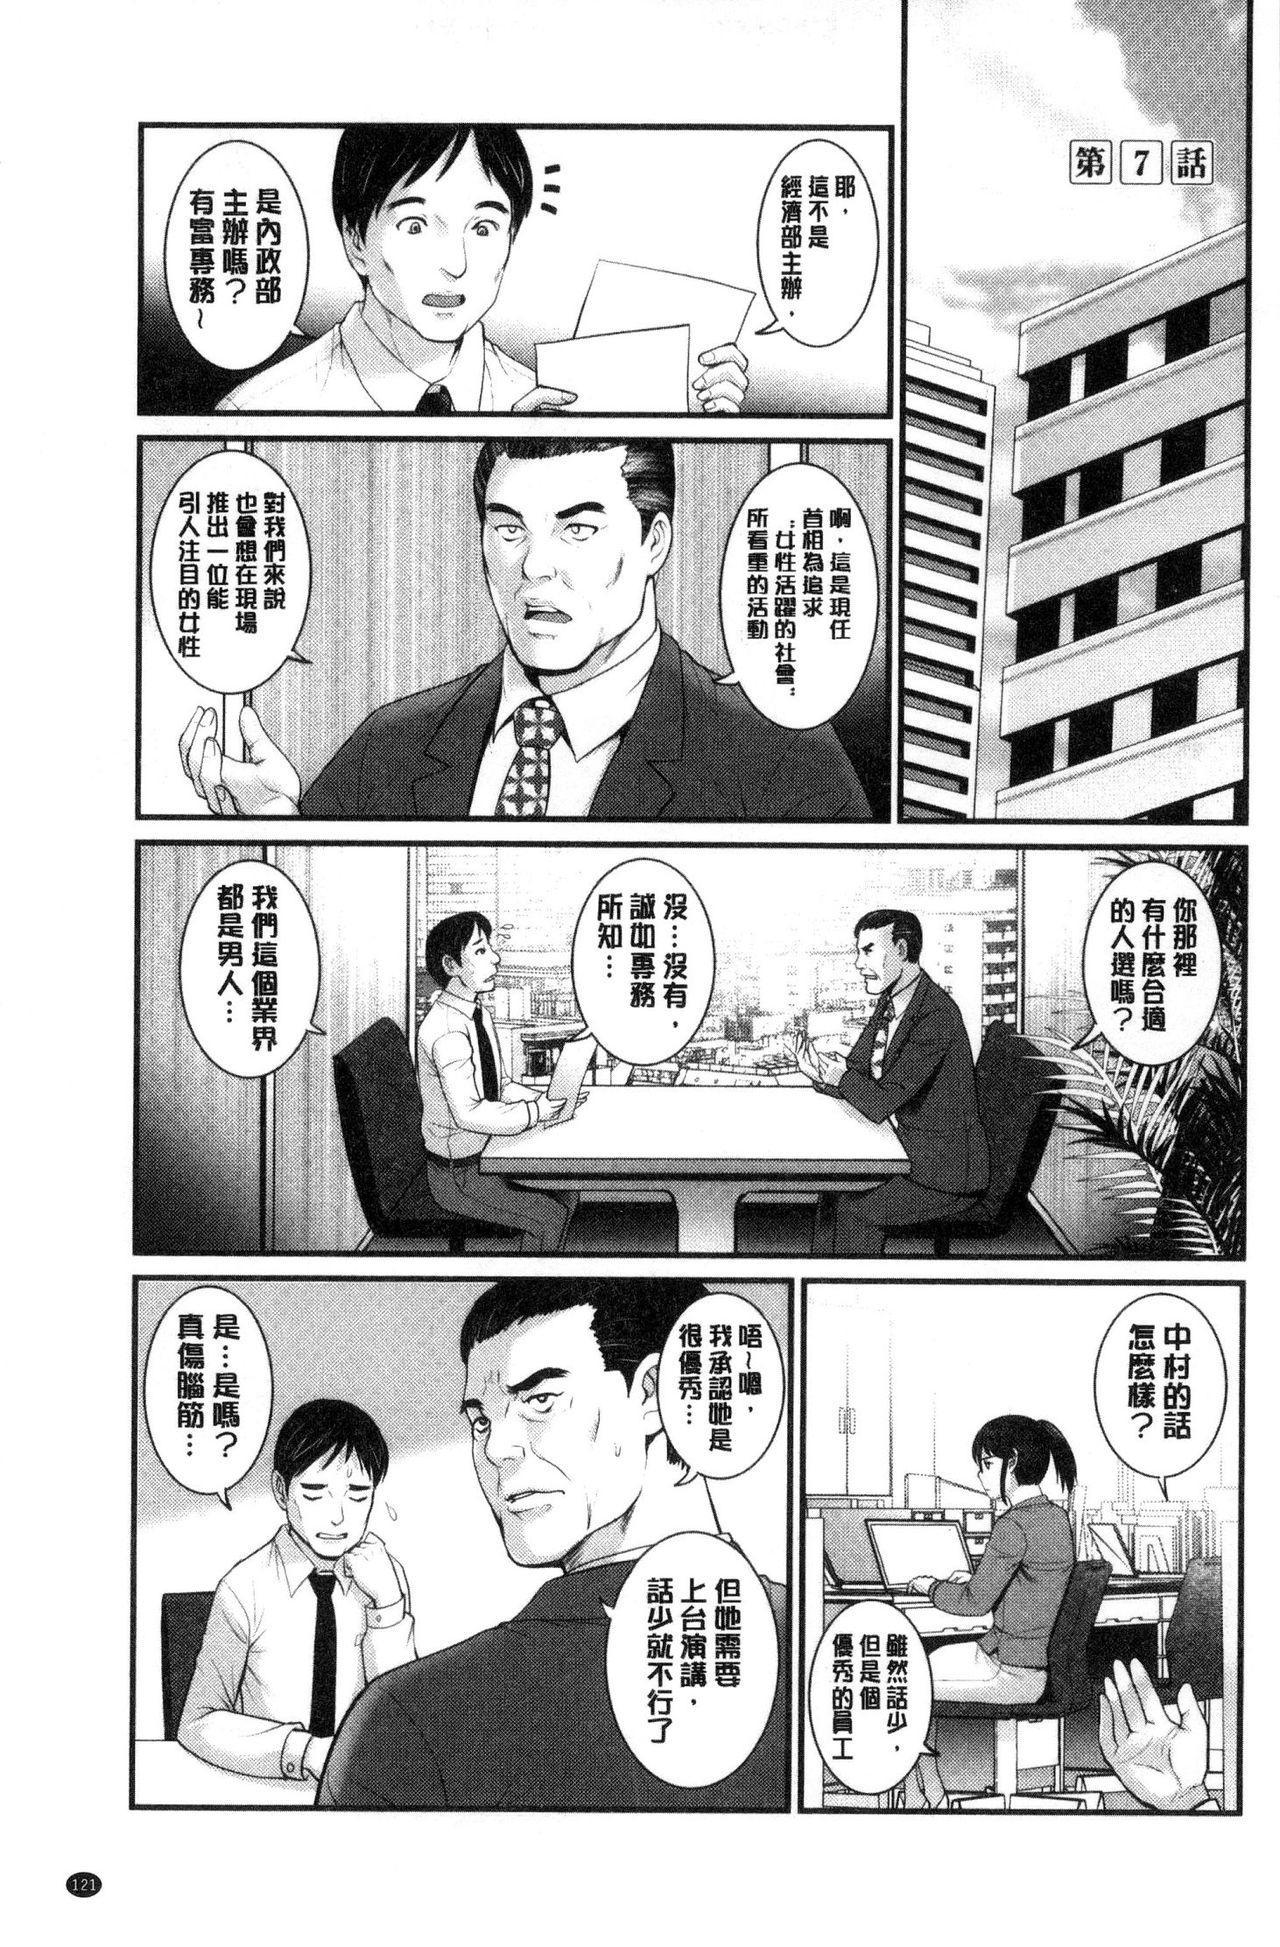 Toshimaku Sodachi no Toshima-san   年增區孕育的豐島小姐 121